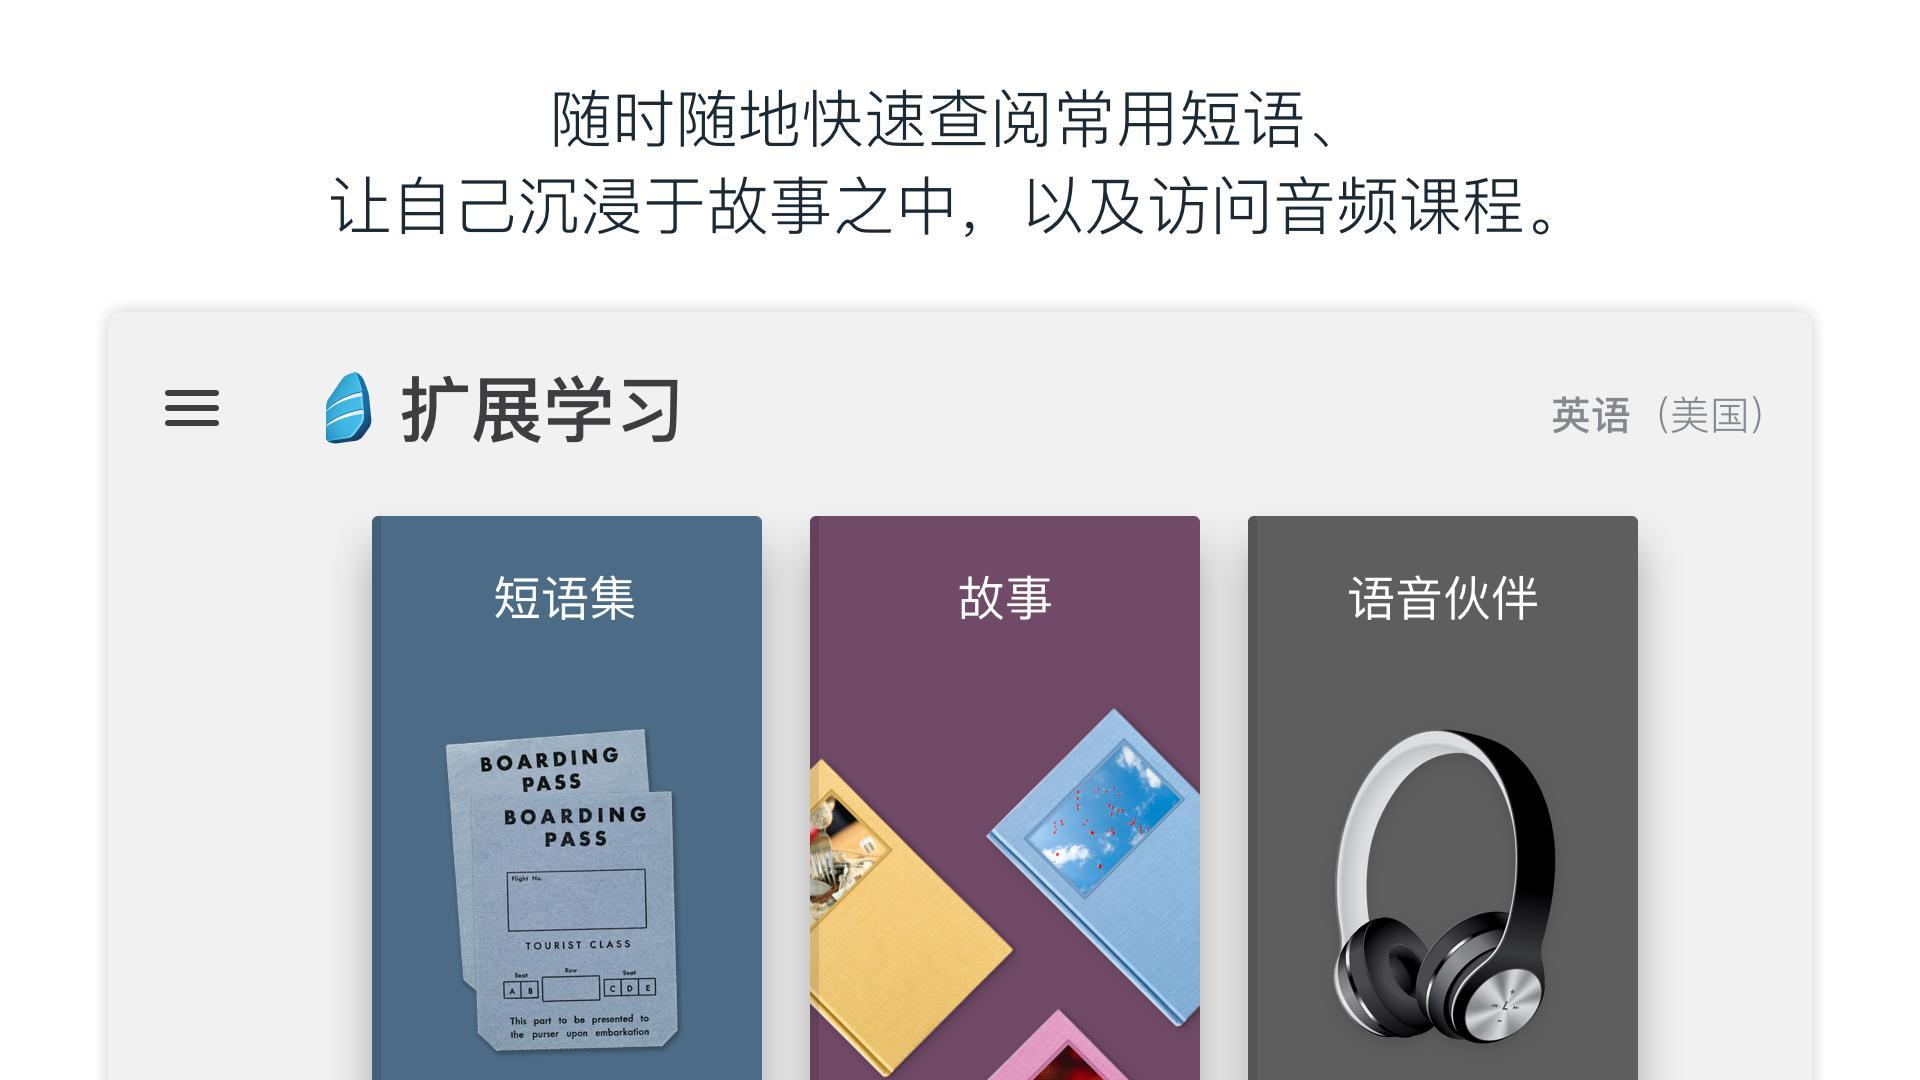 Rosetta Stone:学习说和读新语言 游戏截图5